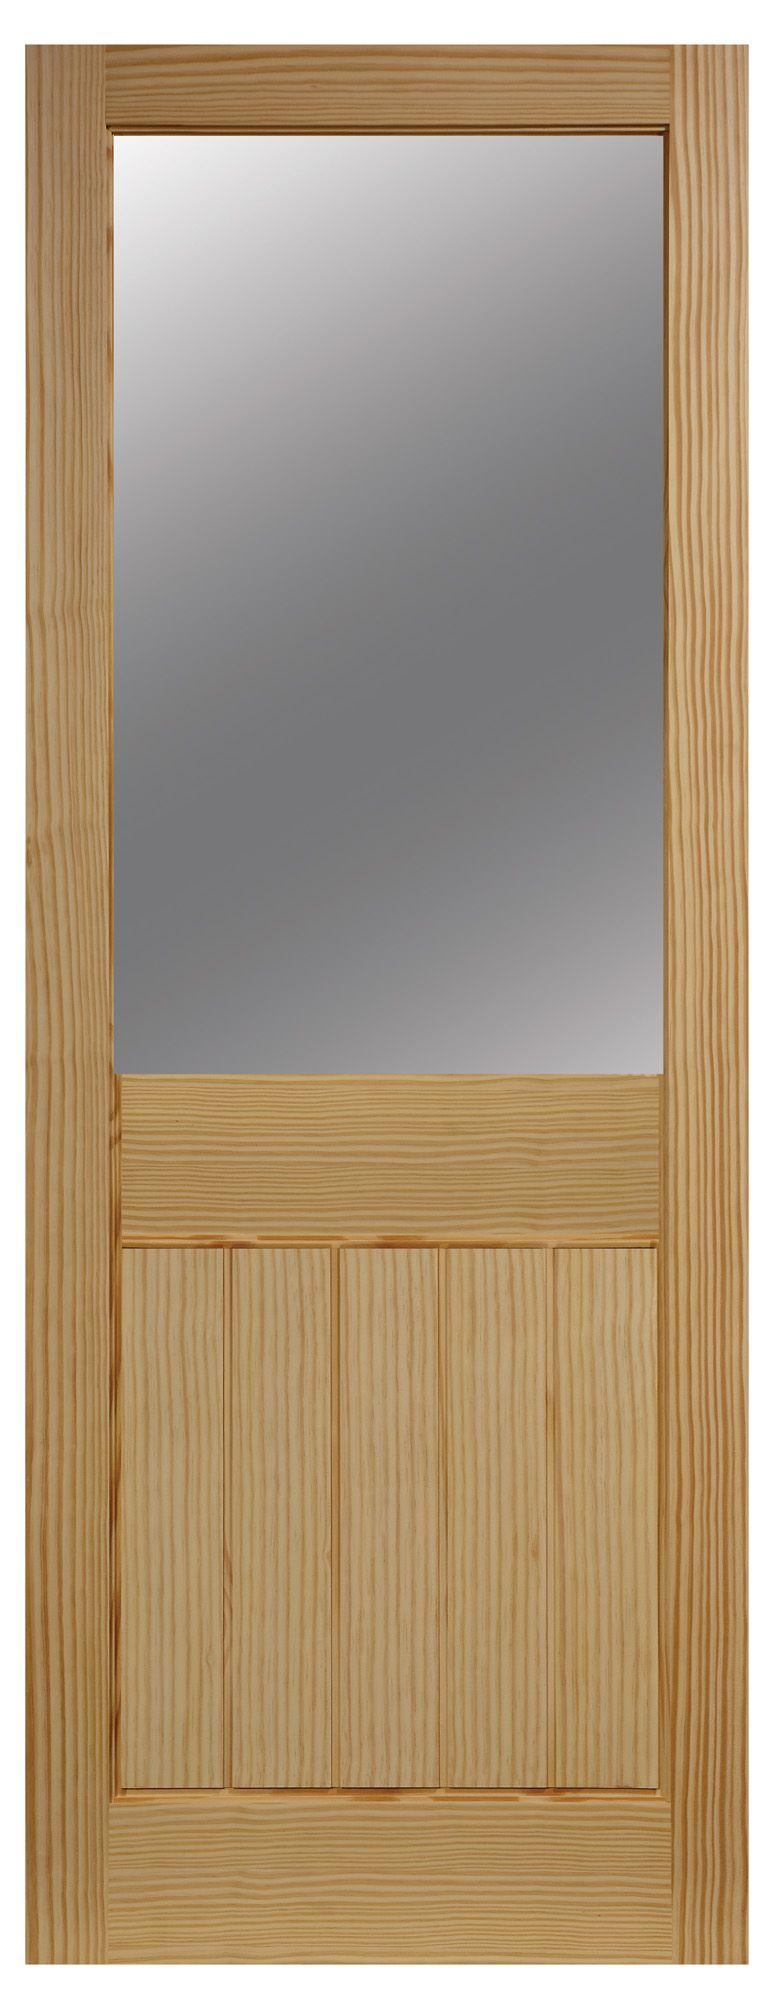 Cottage 2 Panel Clear Pine Glazed Internal Standard Door, (h)1981mm (w)762mm